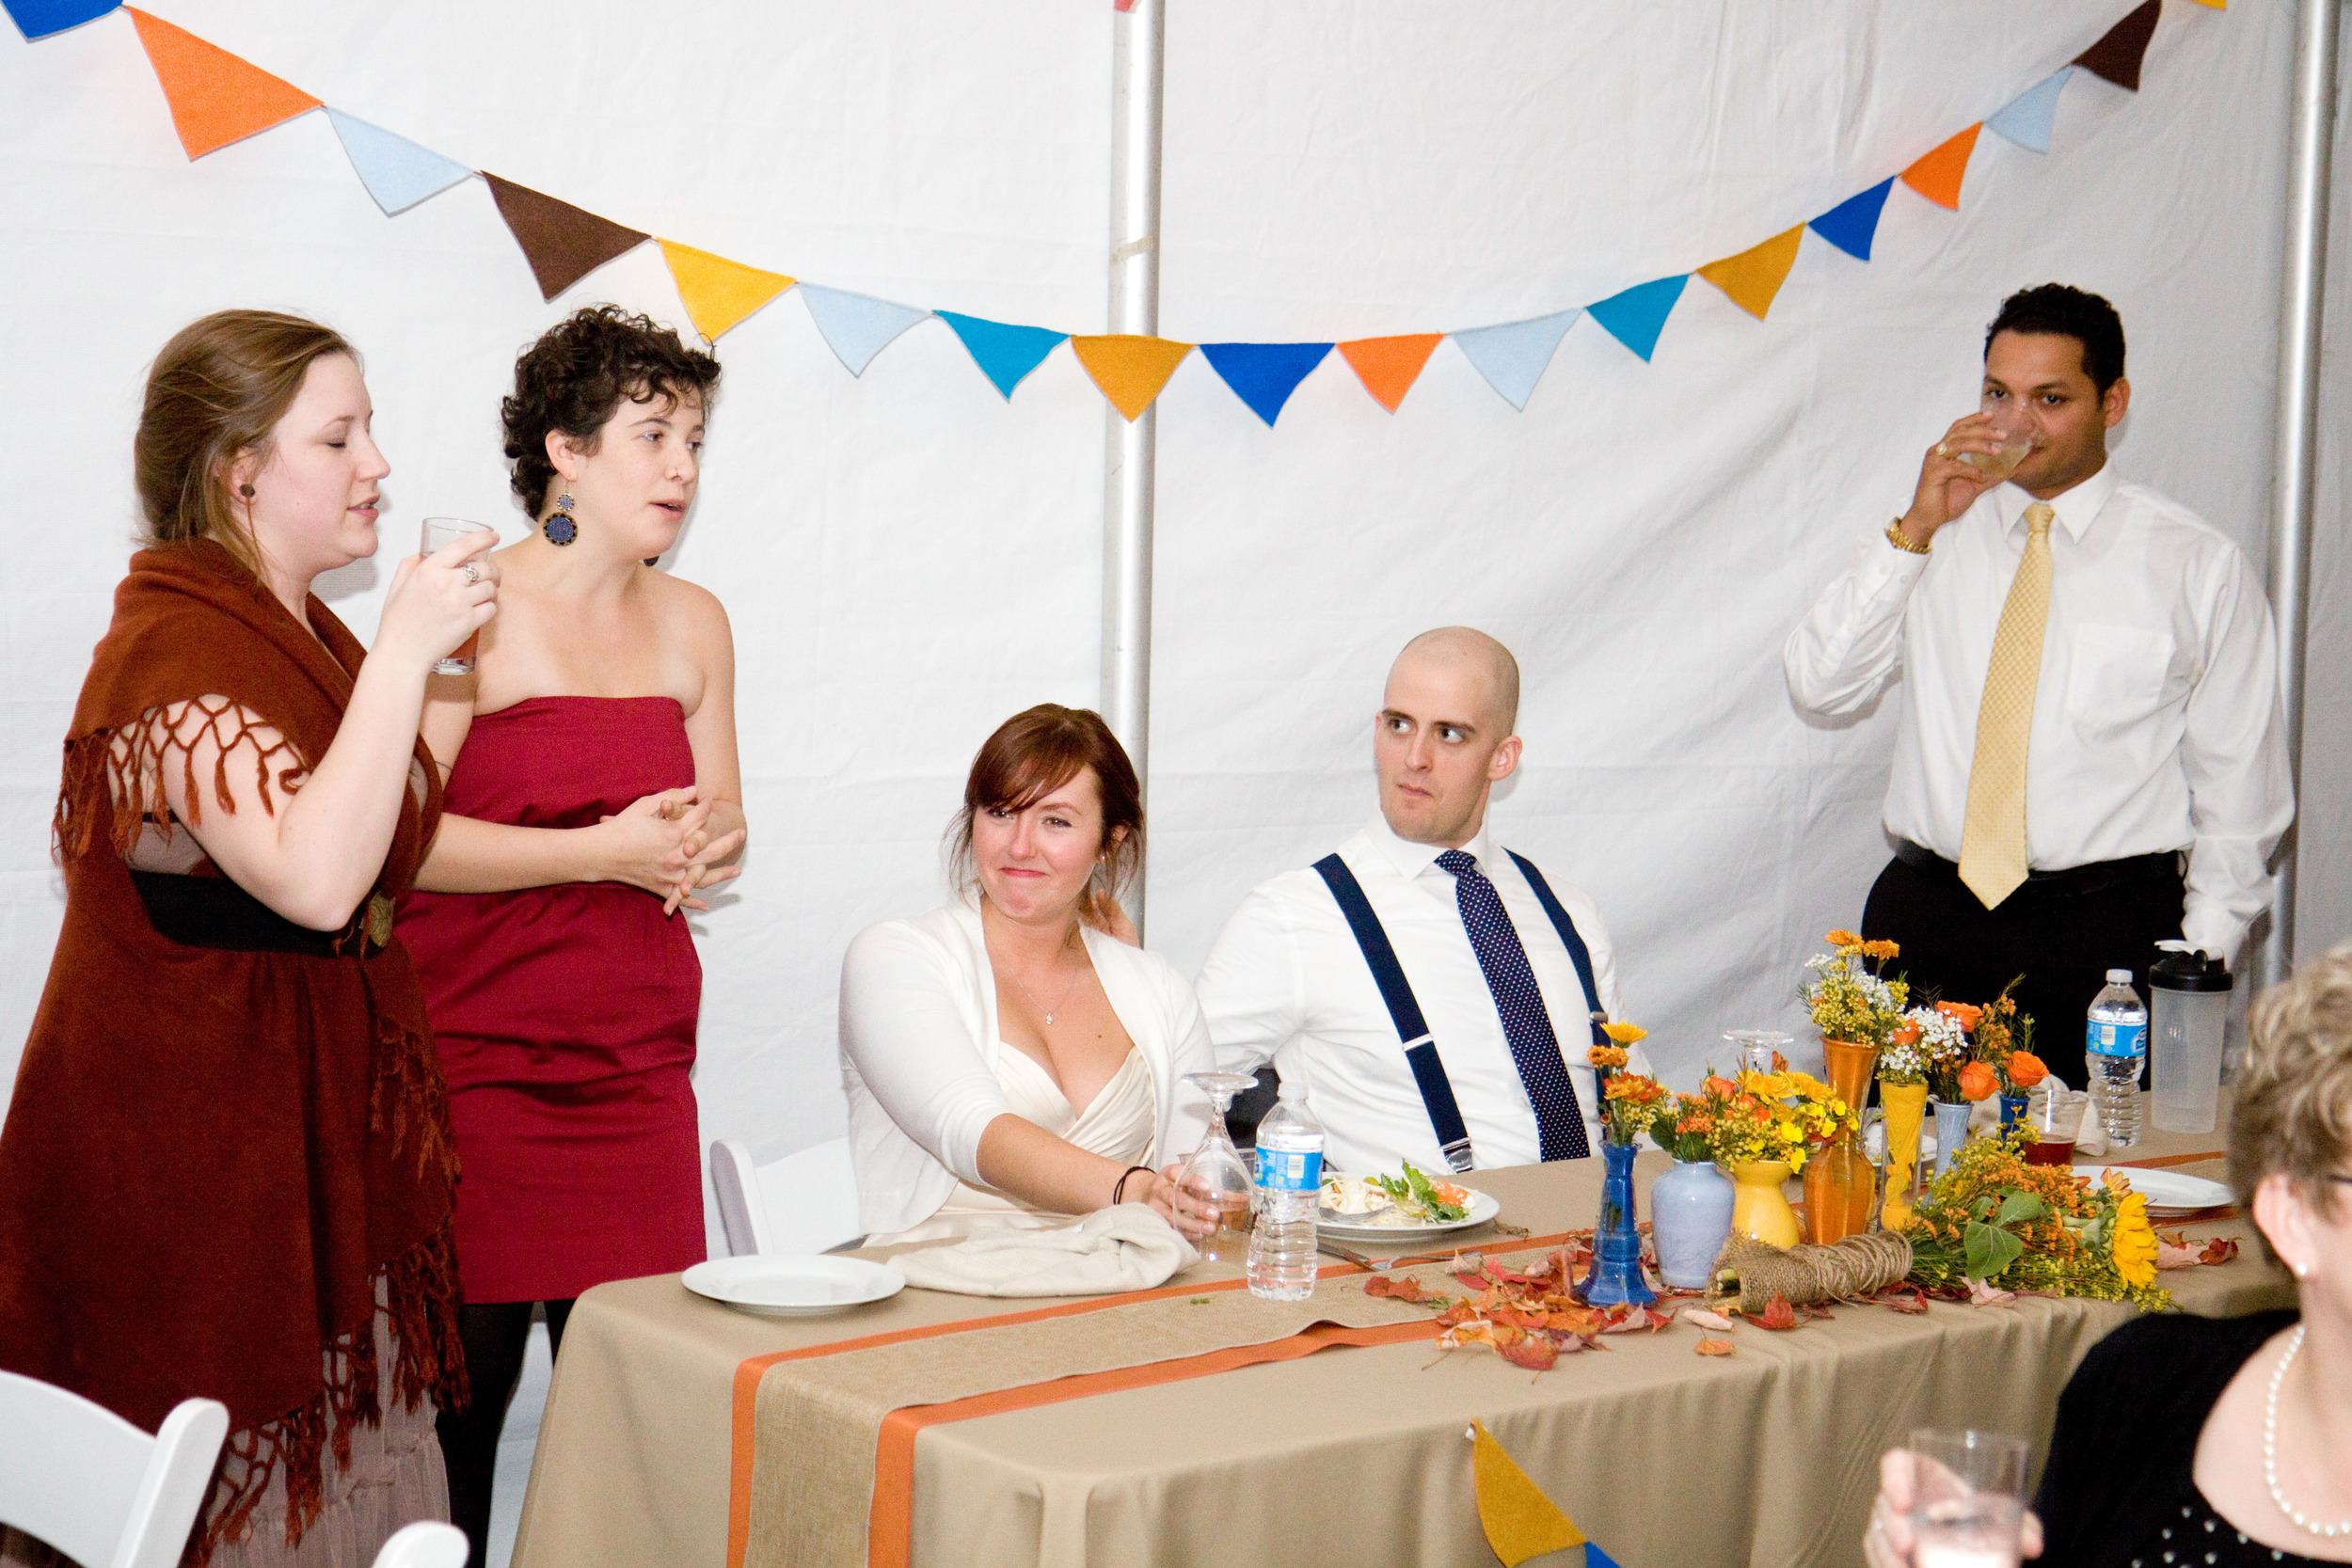 Wilson Bickel Wedding - Reception and Ceremony (307 of 526).jpg